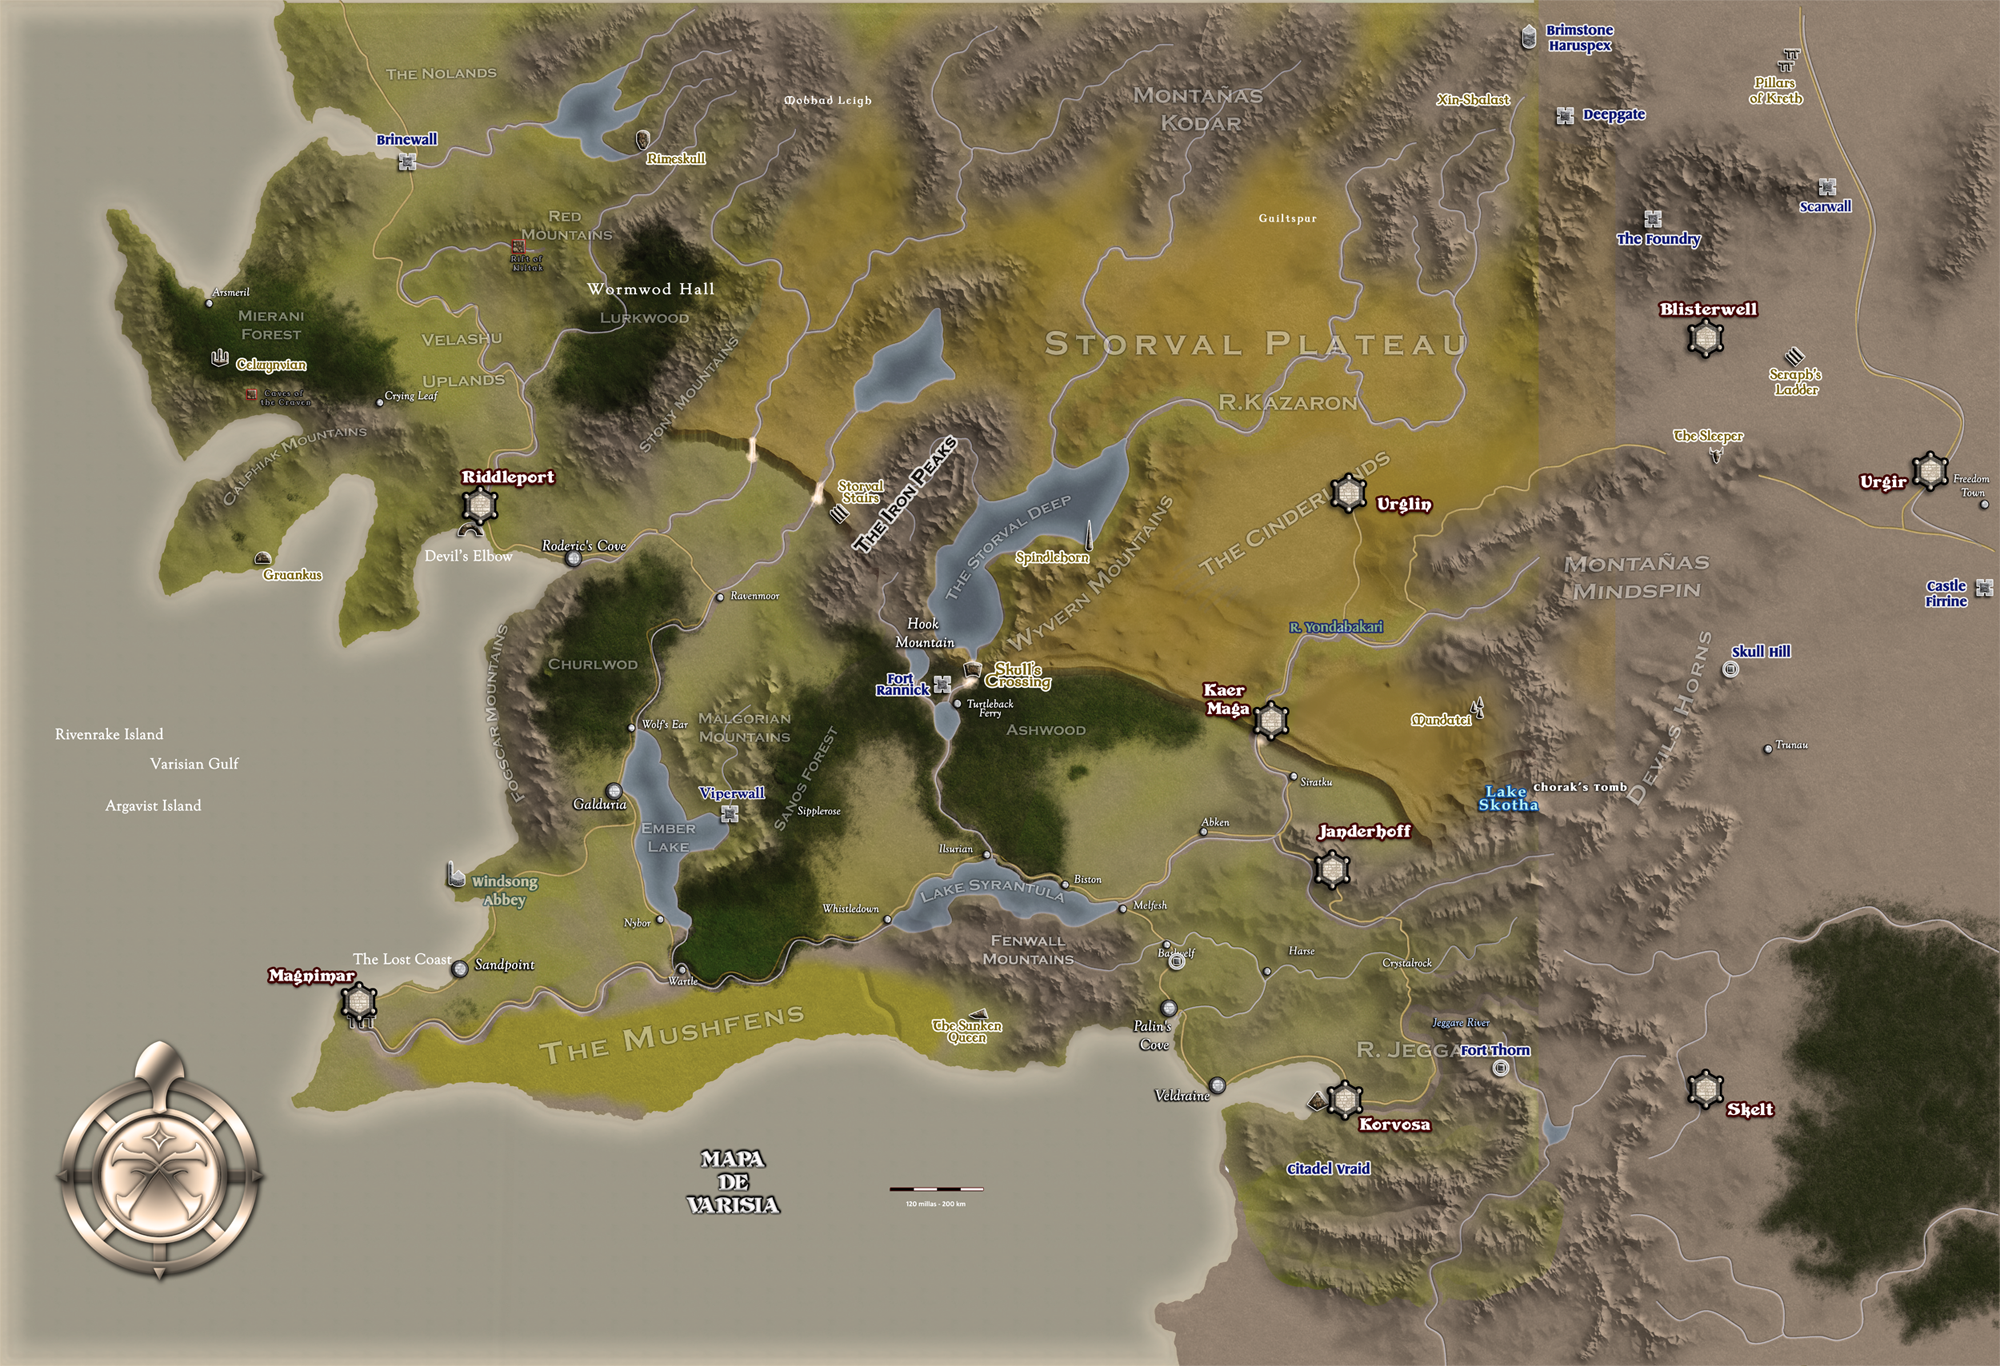 Http://www.cartographersguild.com/attachments/regional World